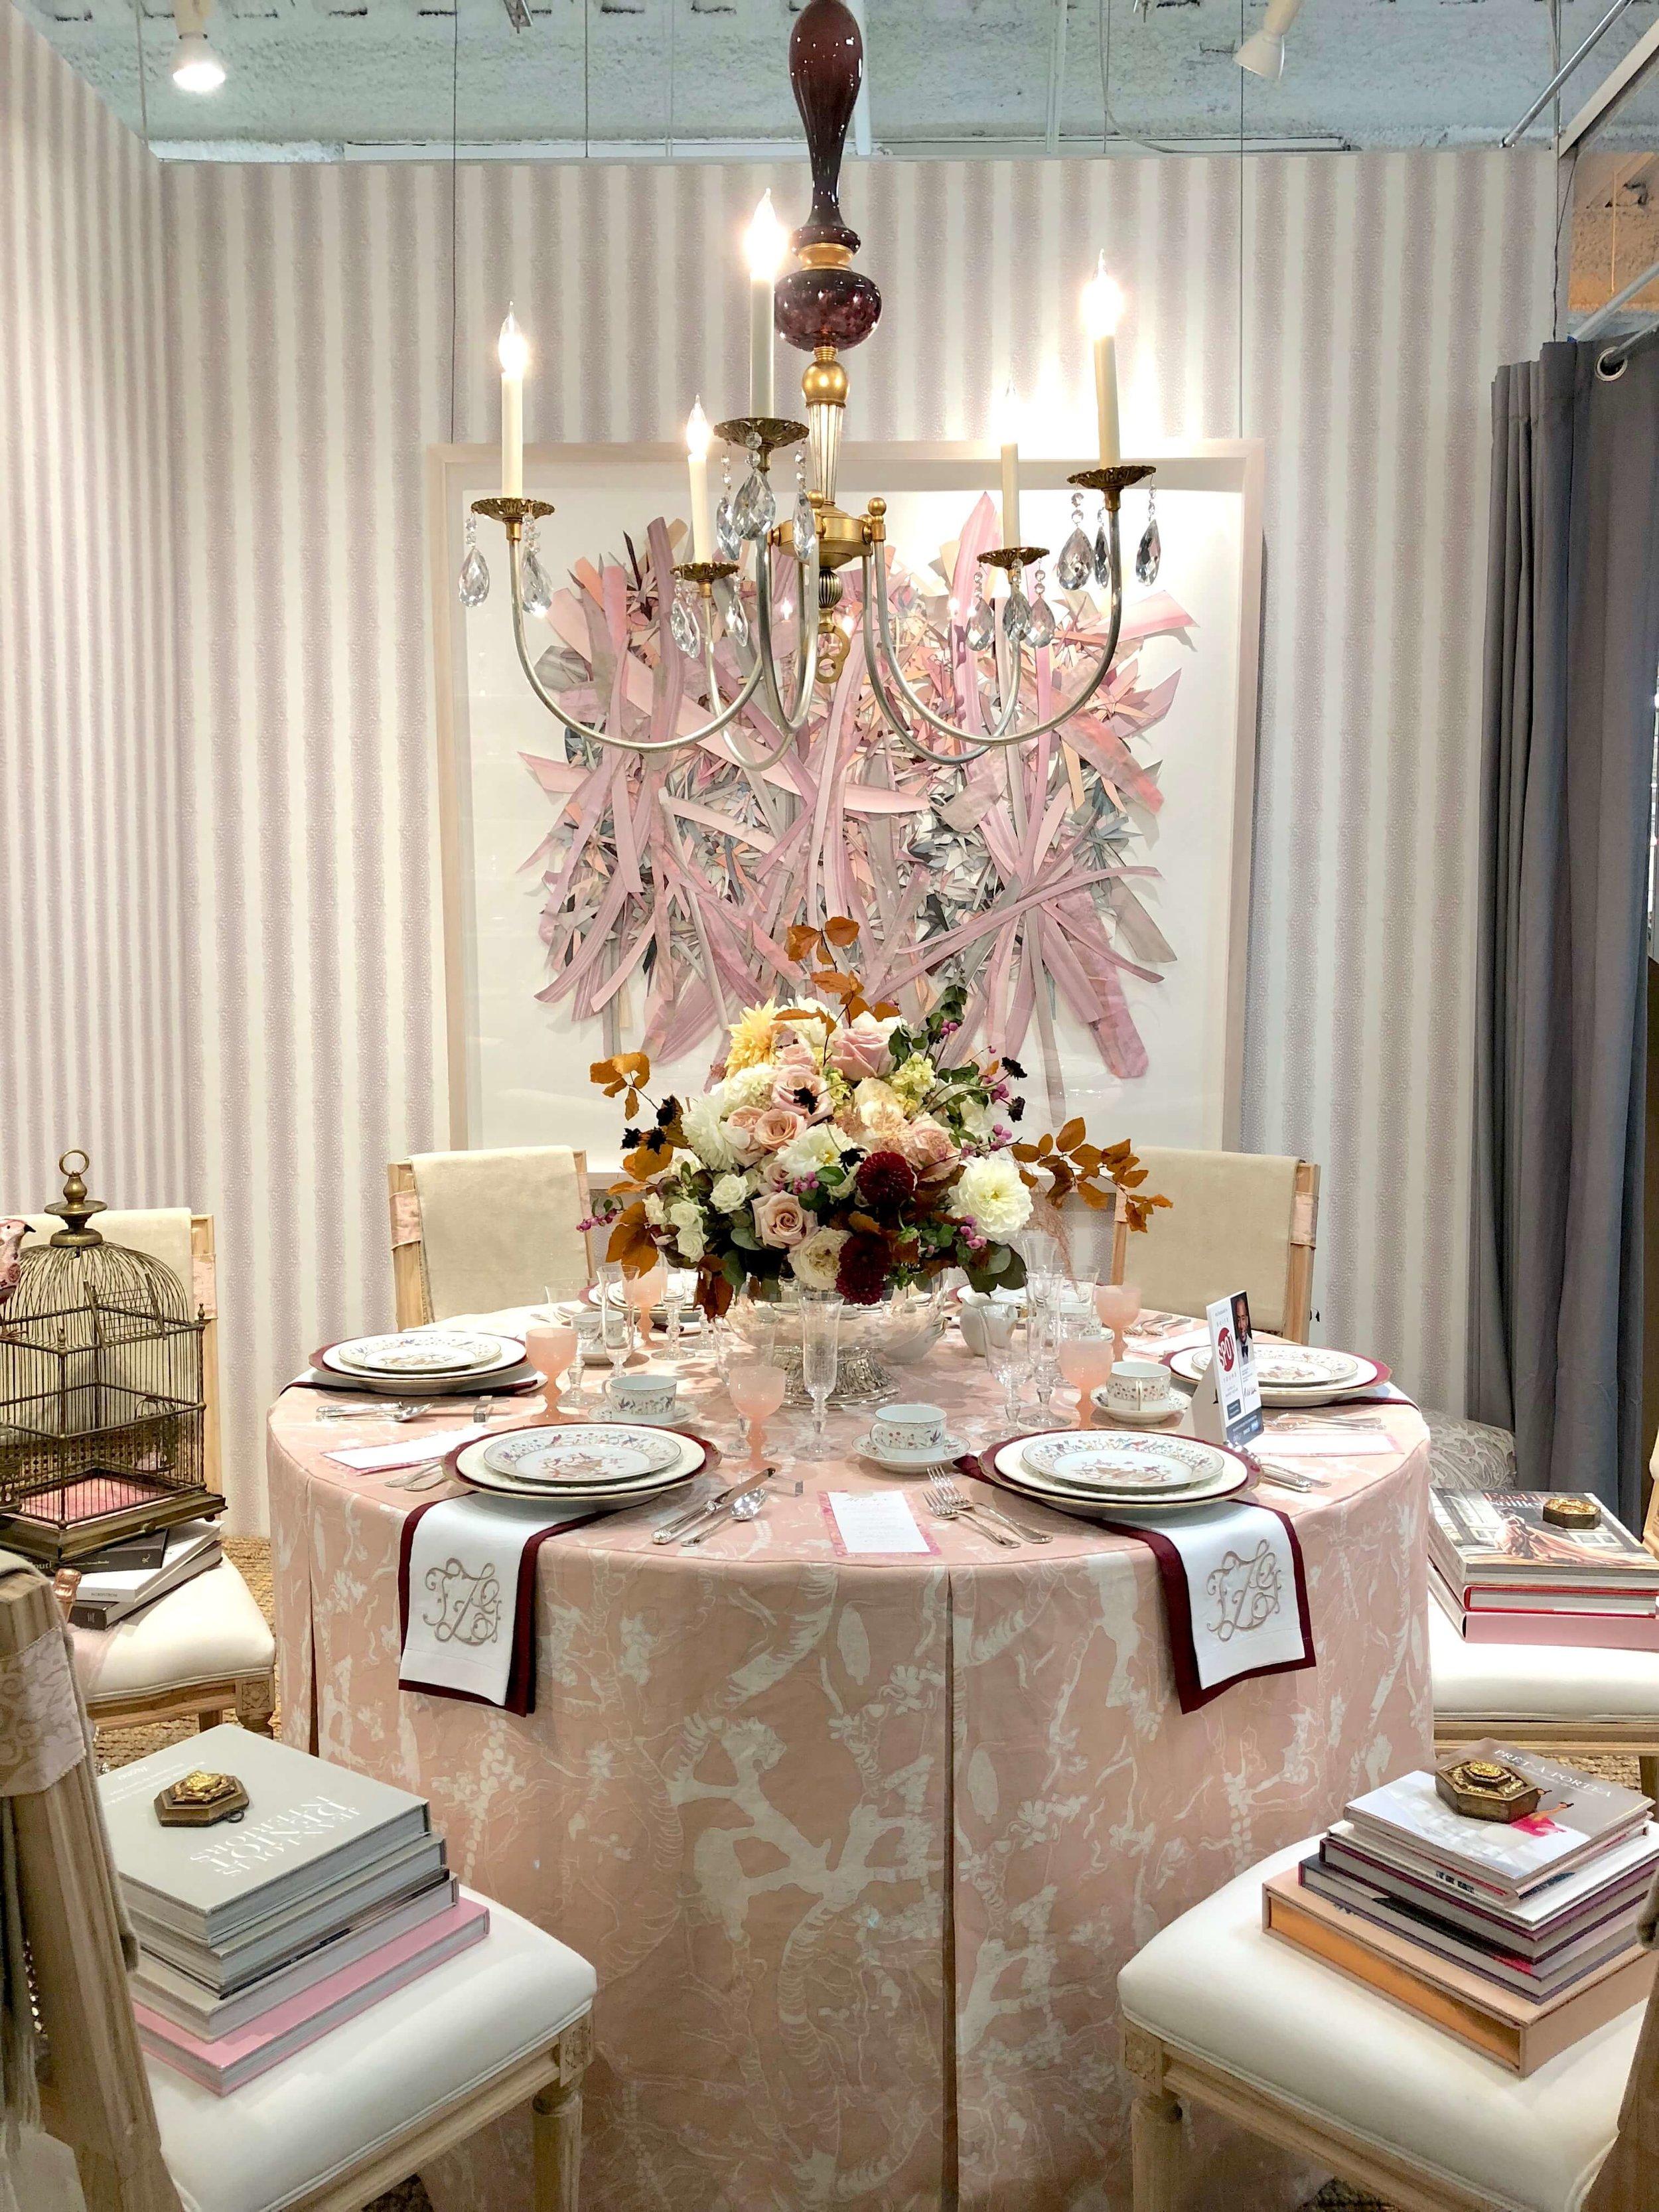 Pink dining room designed by Traci Zeller for Replacements, Ltd. Showroom #hpmkt #pinkroom #diningroomideas